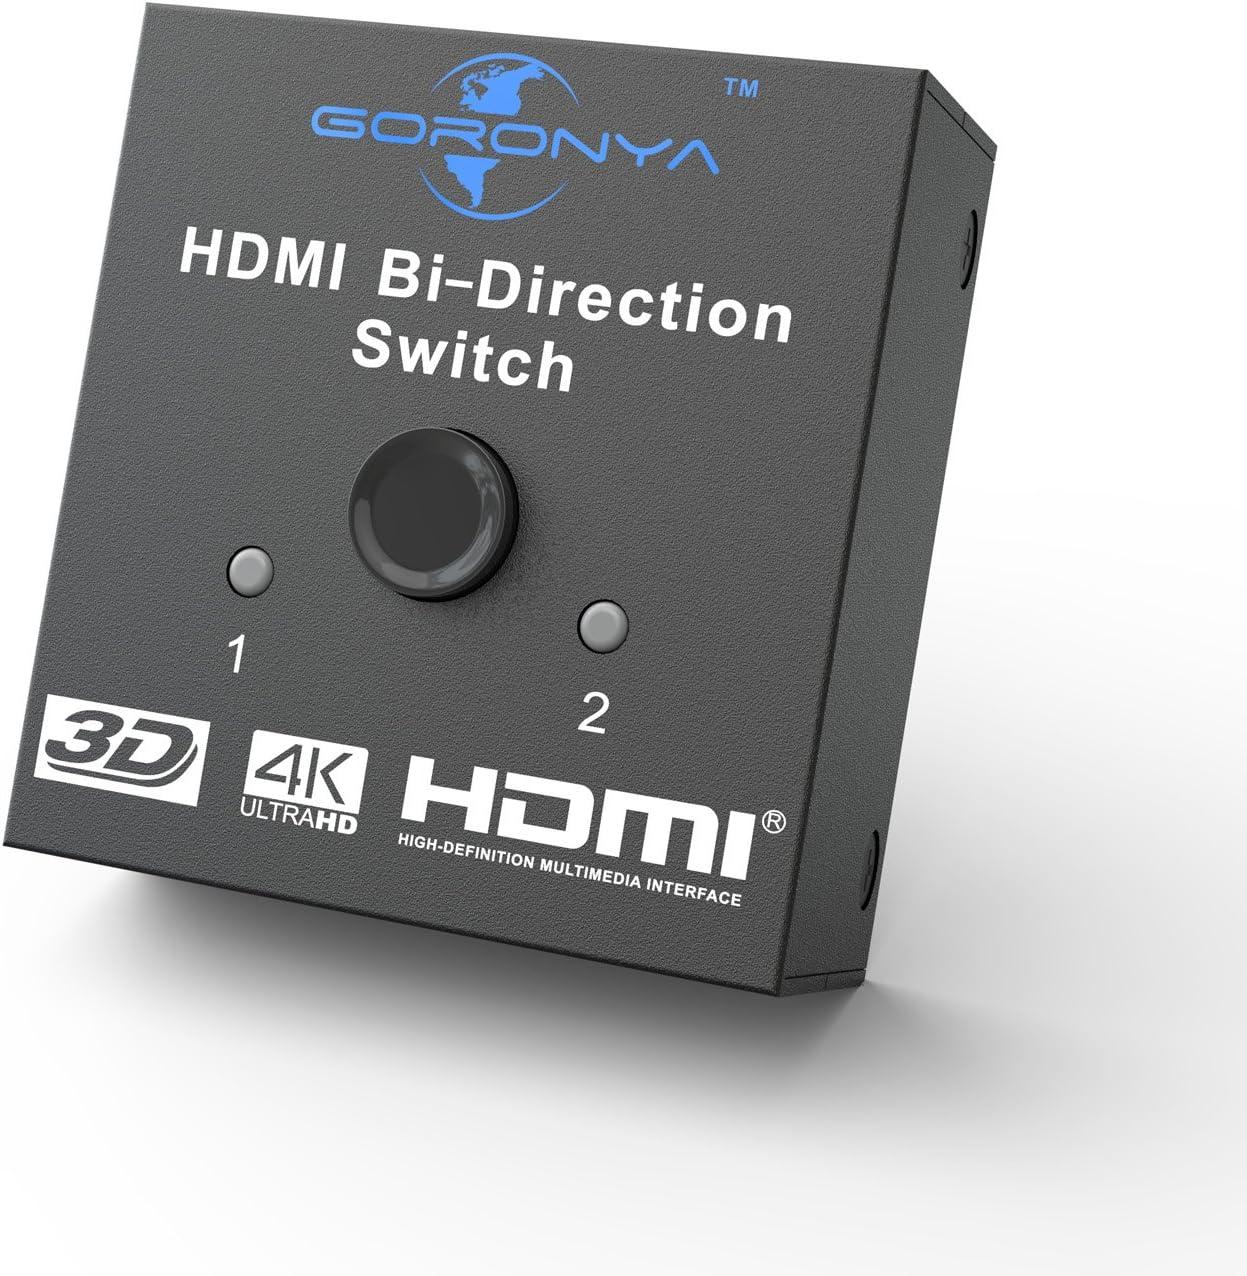 Amazon Com Goronya True 4k Hdmi Switch 2 Ports Bi Directional Switch 2x1 1x2 Hdmi Hub Supports 4k 60hz Ultra Hd 1080p 3d And Hdcp Pass Through Electronics